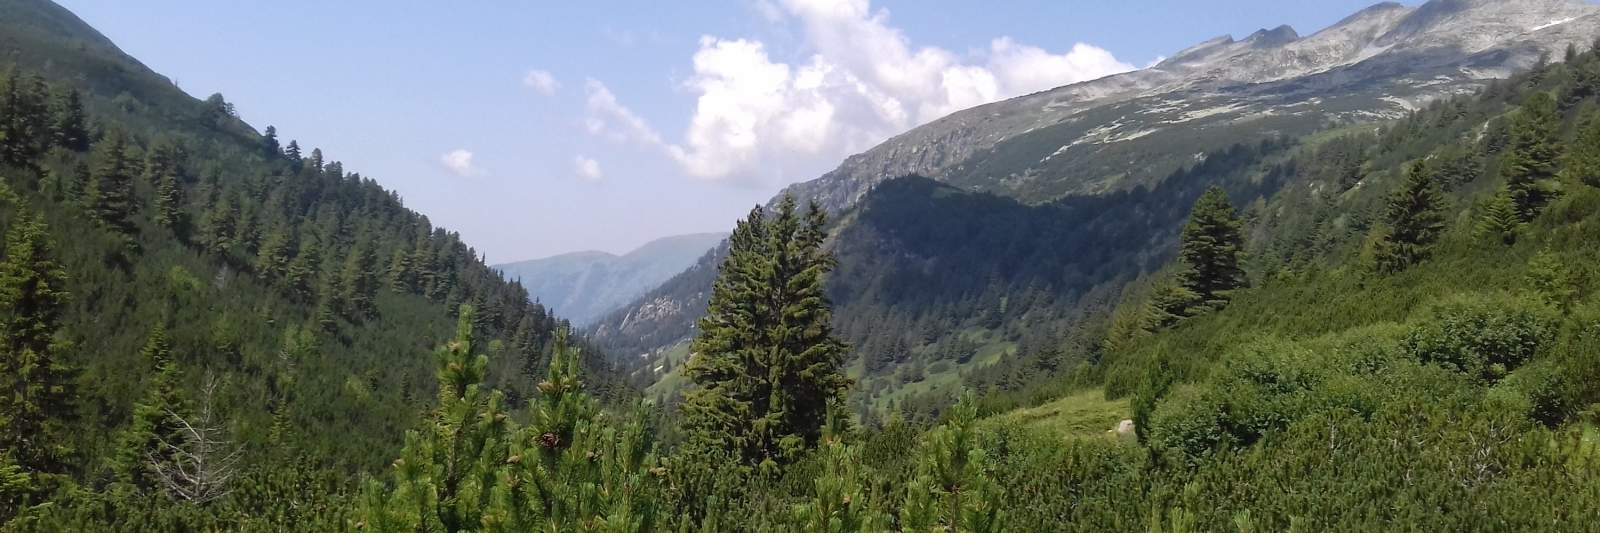 Blick von Kobilino Braniste - Foto: Rila Monastery Park Directorate